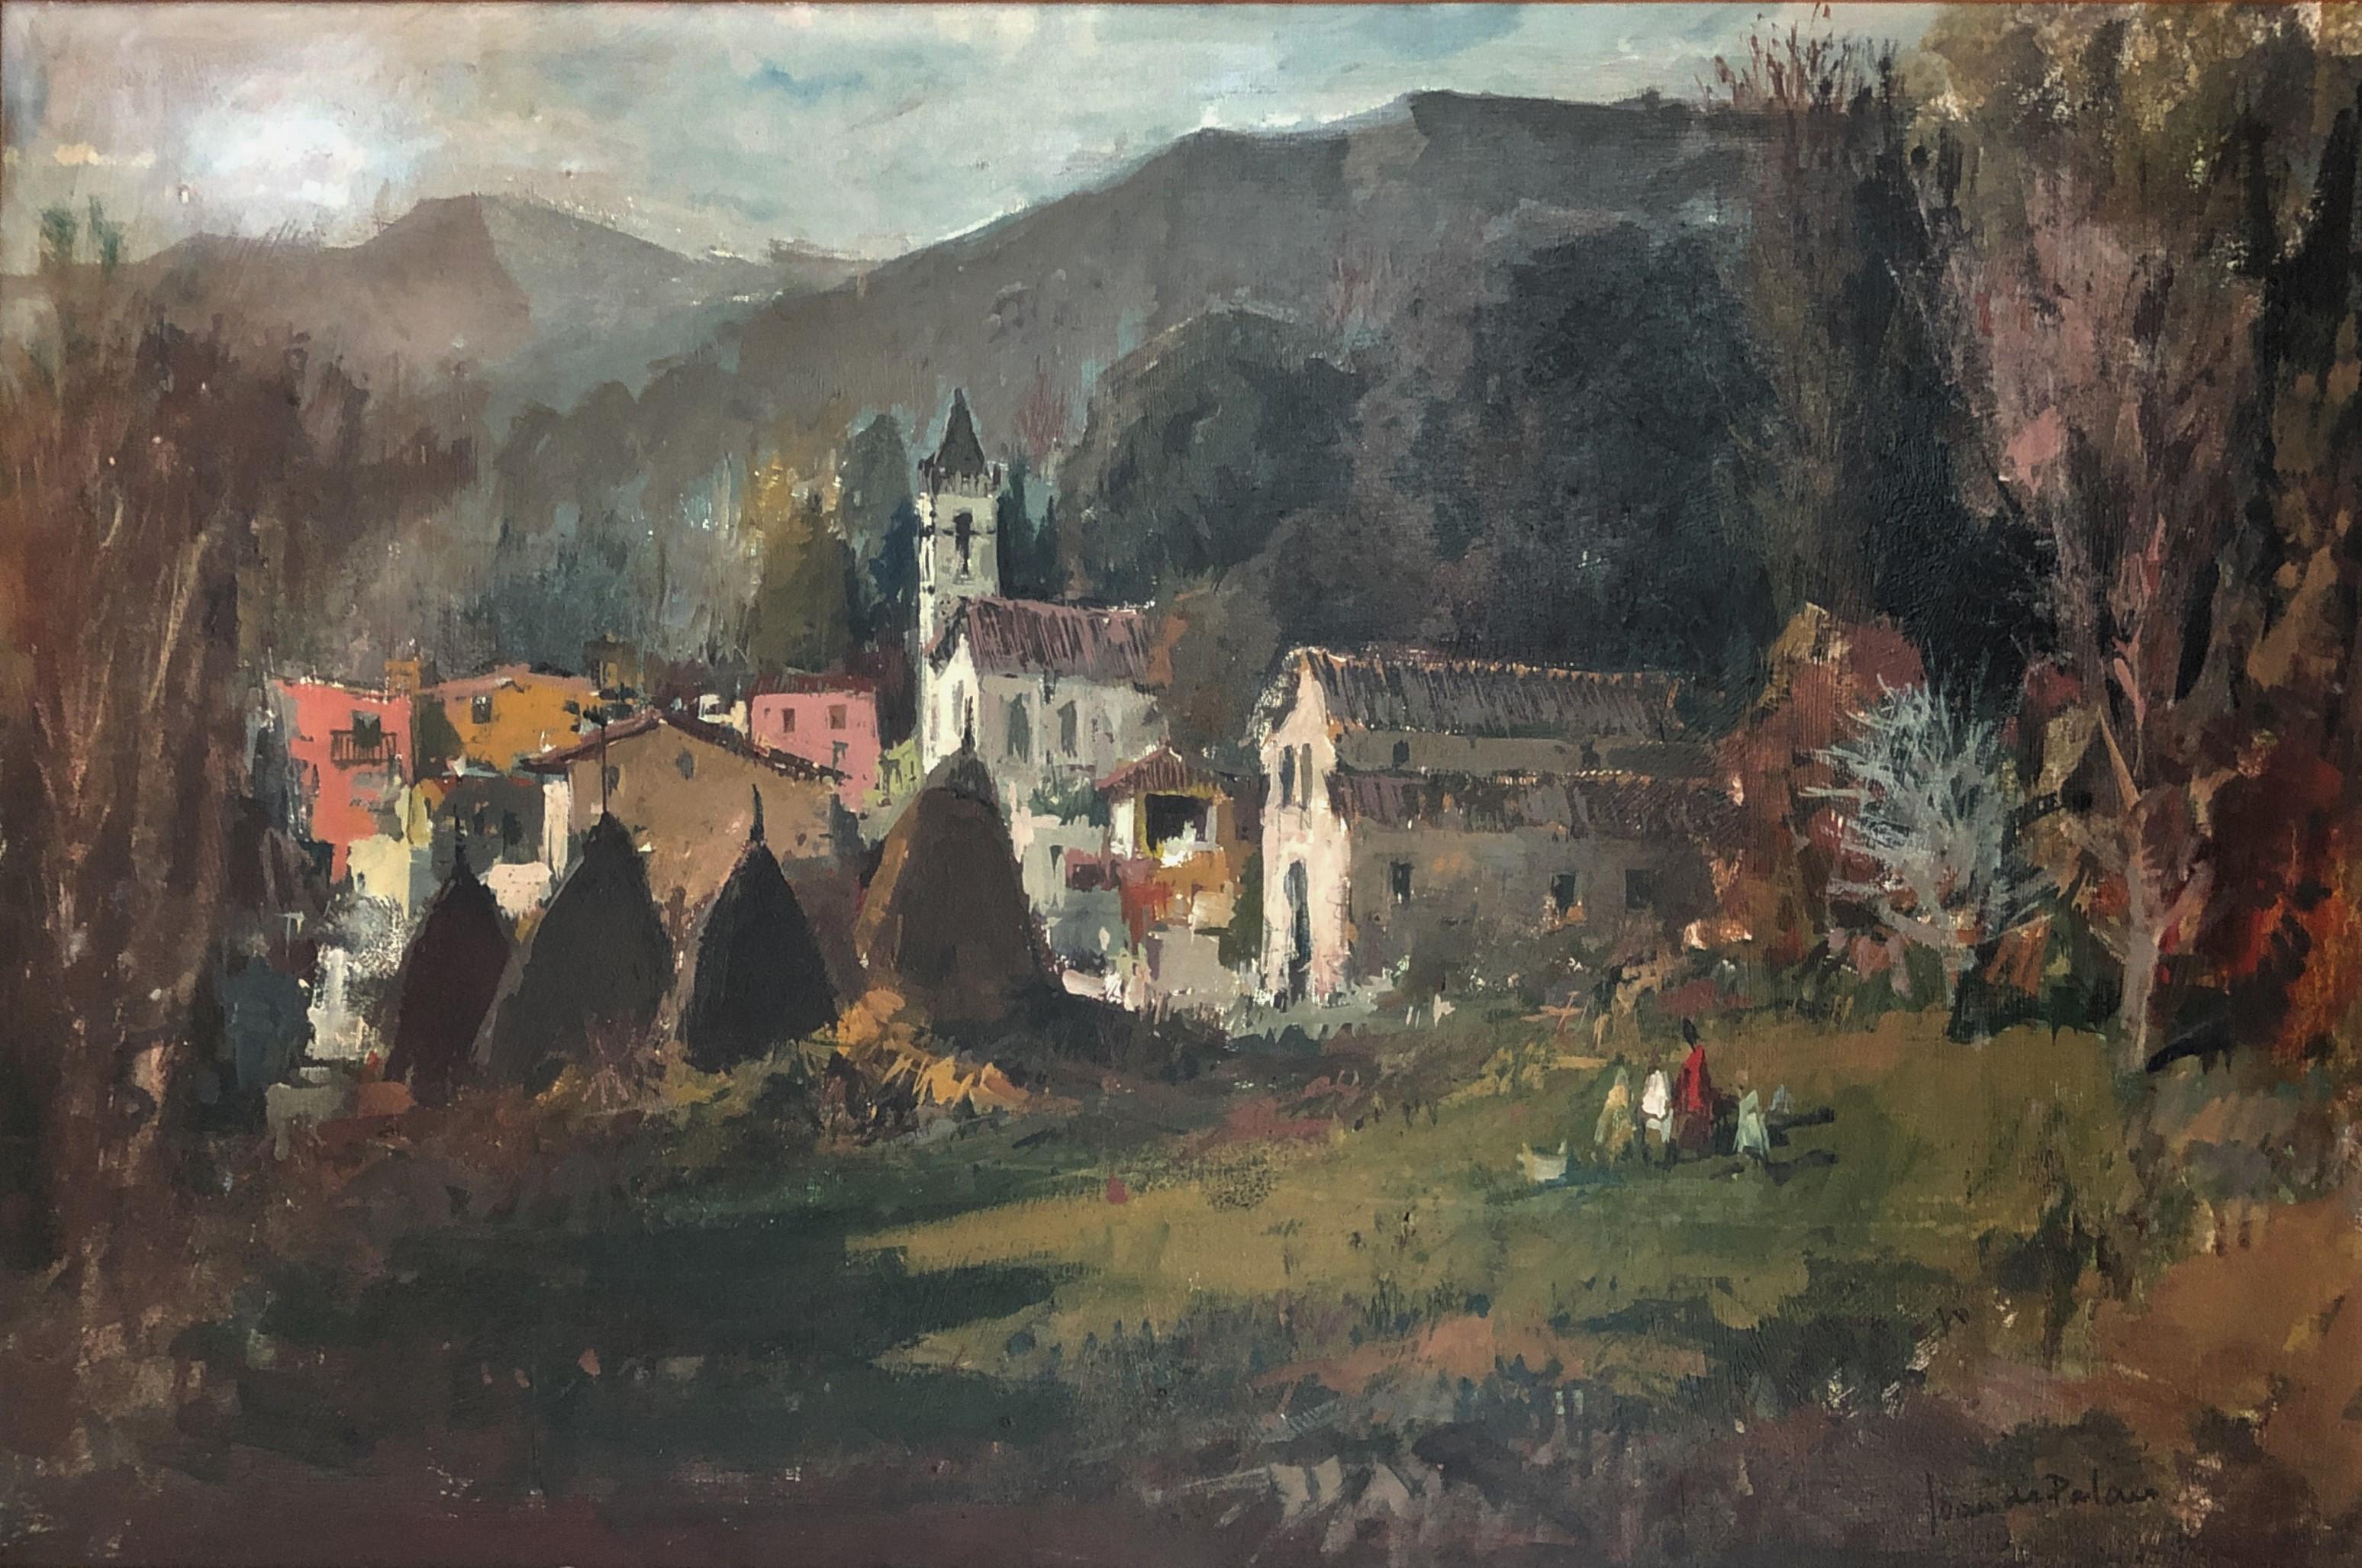 Spanish landscape oil on canvas painting framed